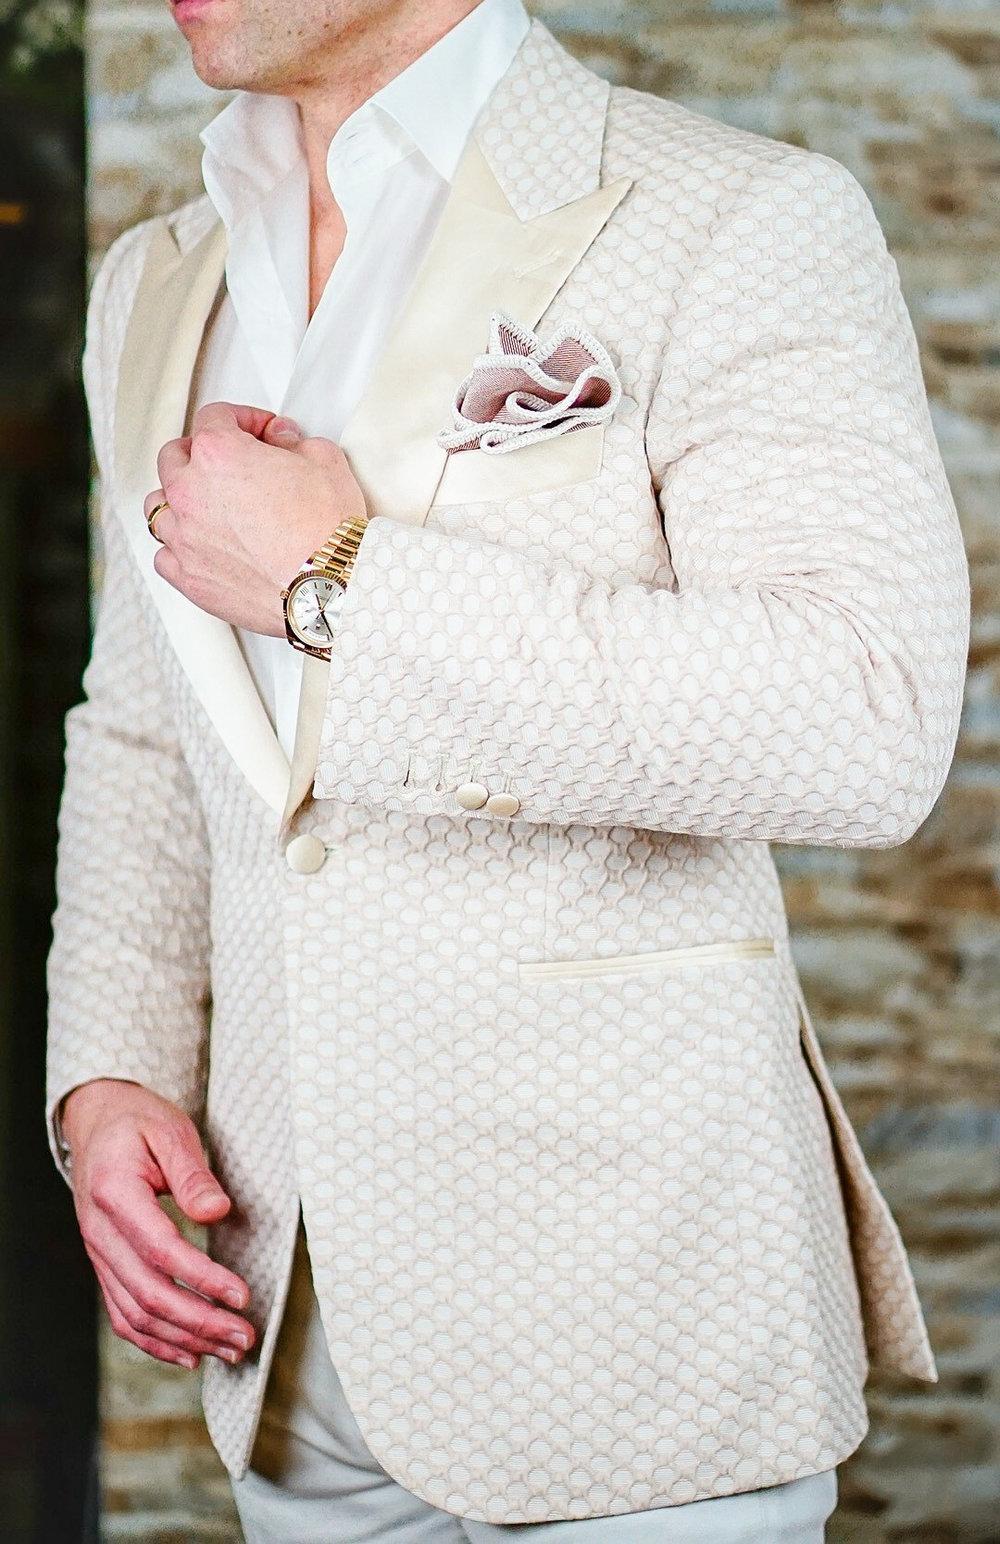 His-Attire-Wedding-Jacket-White